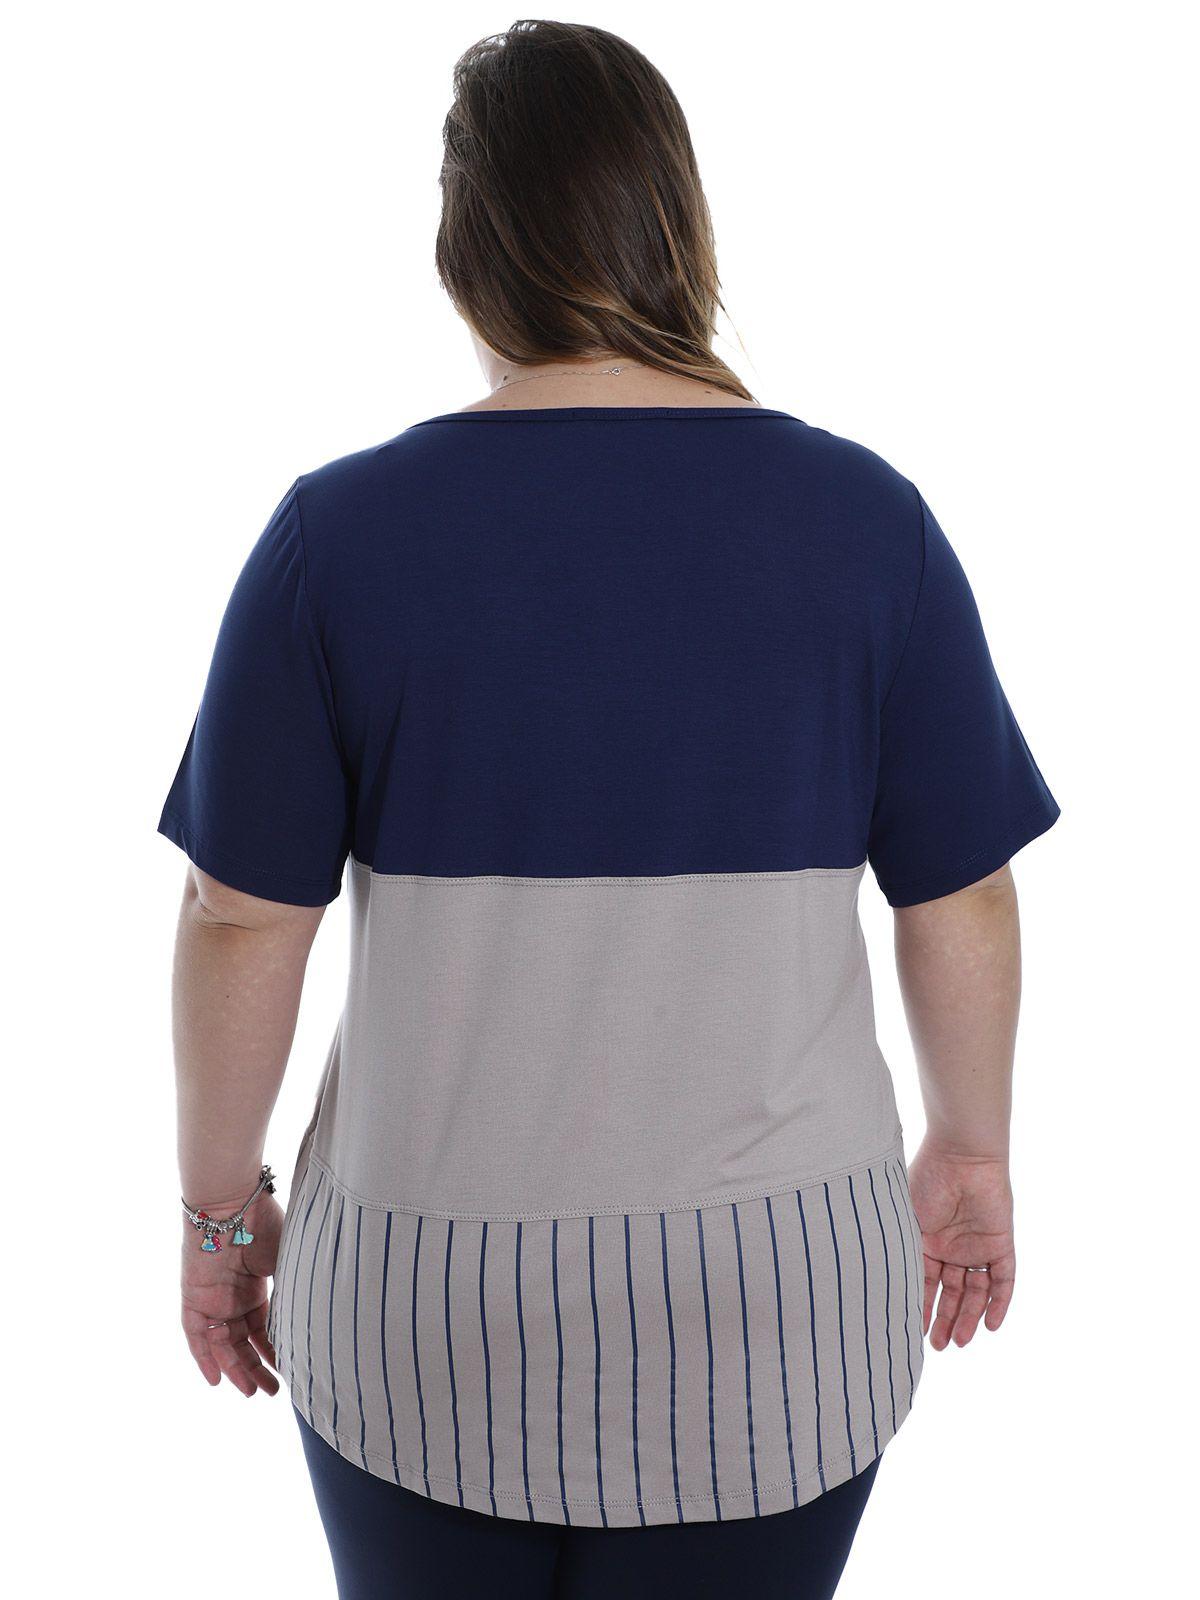 Blusa Plus Size KTS Viscolycra Bicolor Marinho